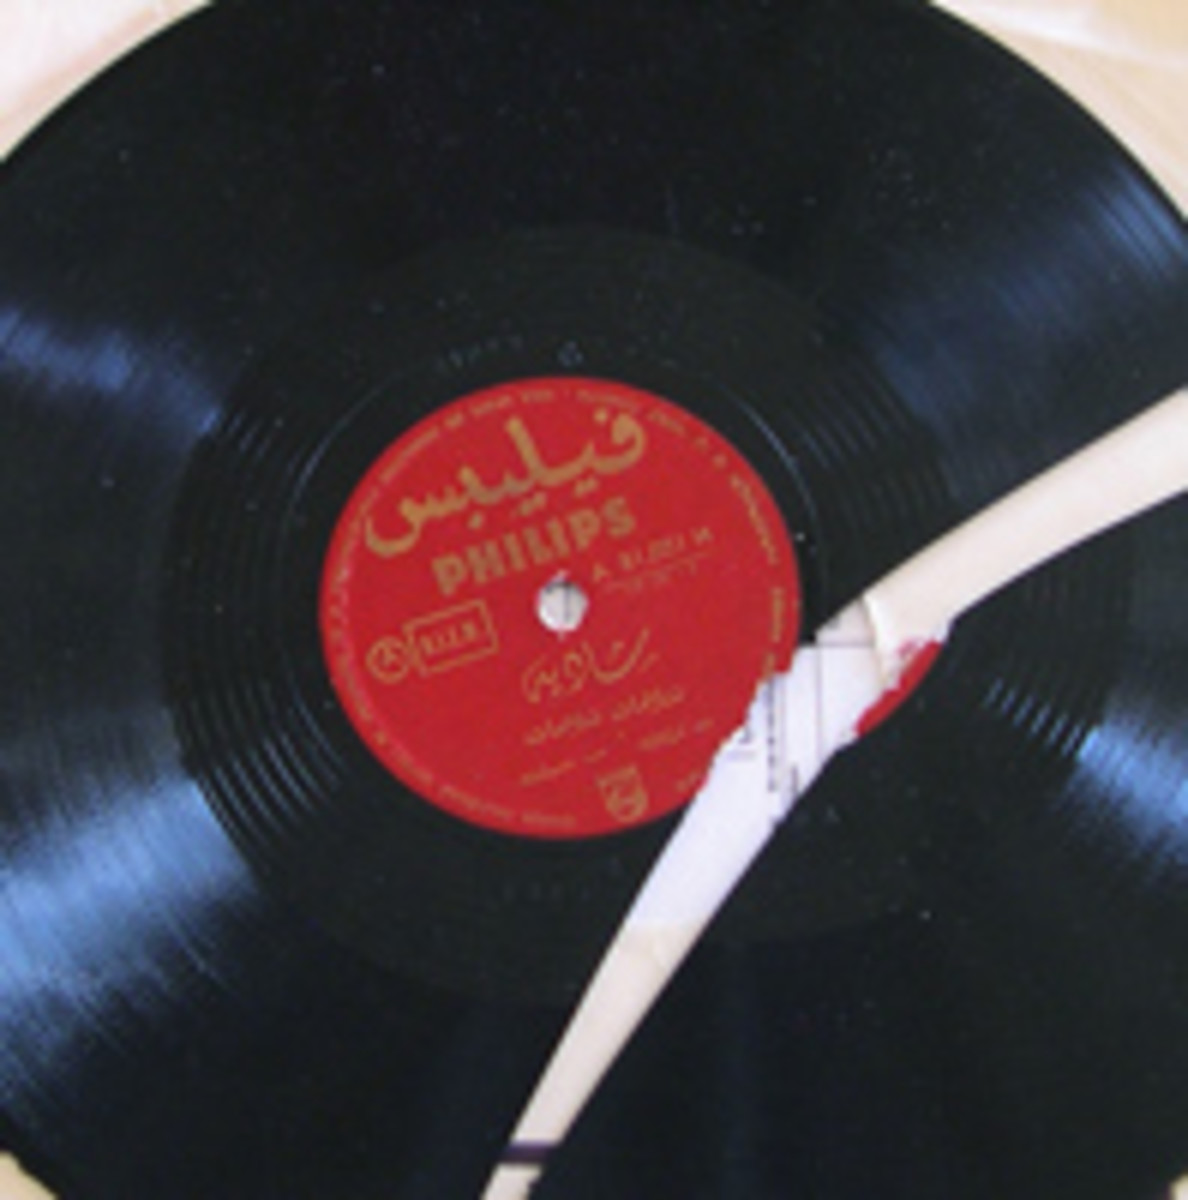 broken 78 rpm record